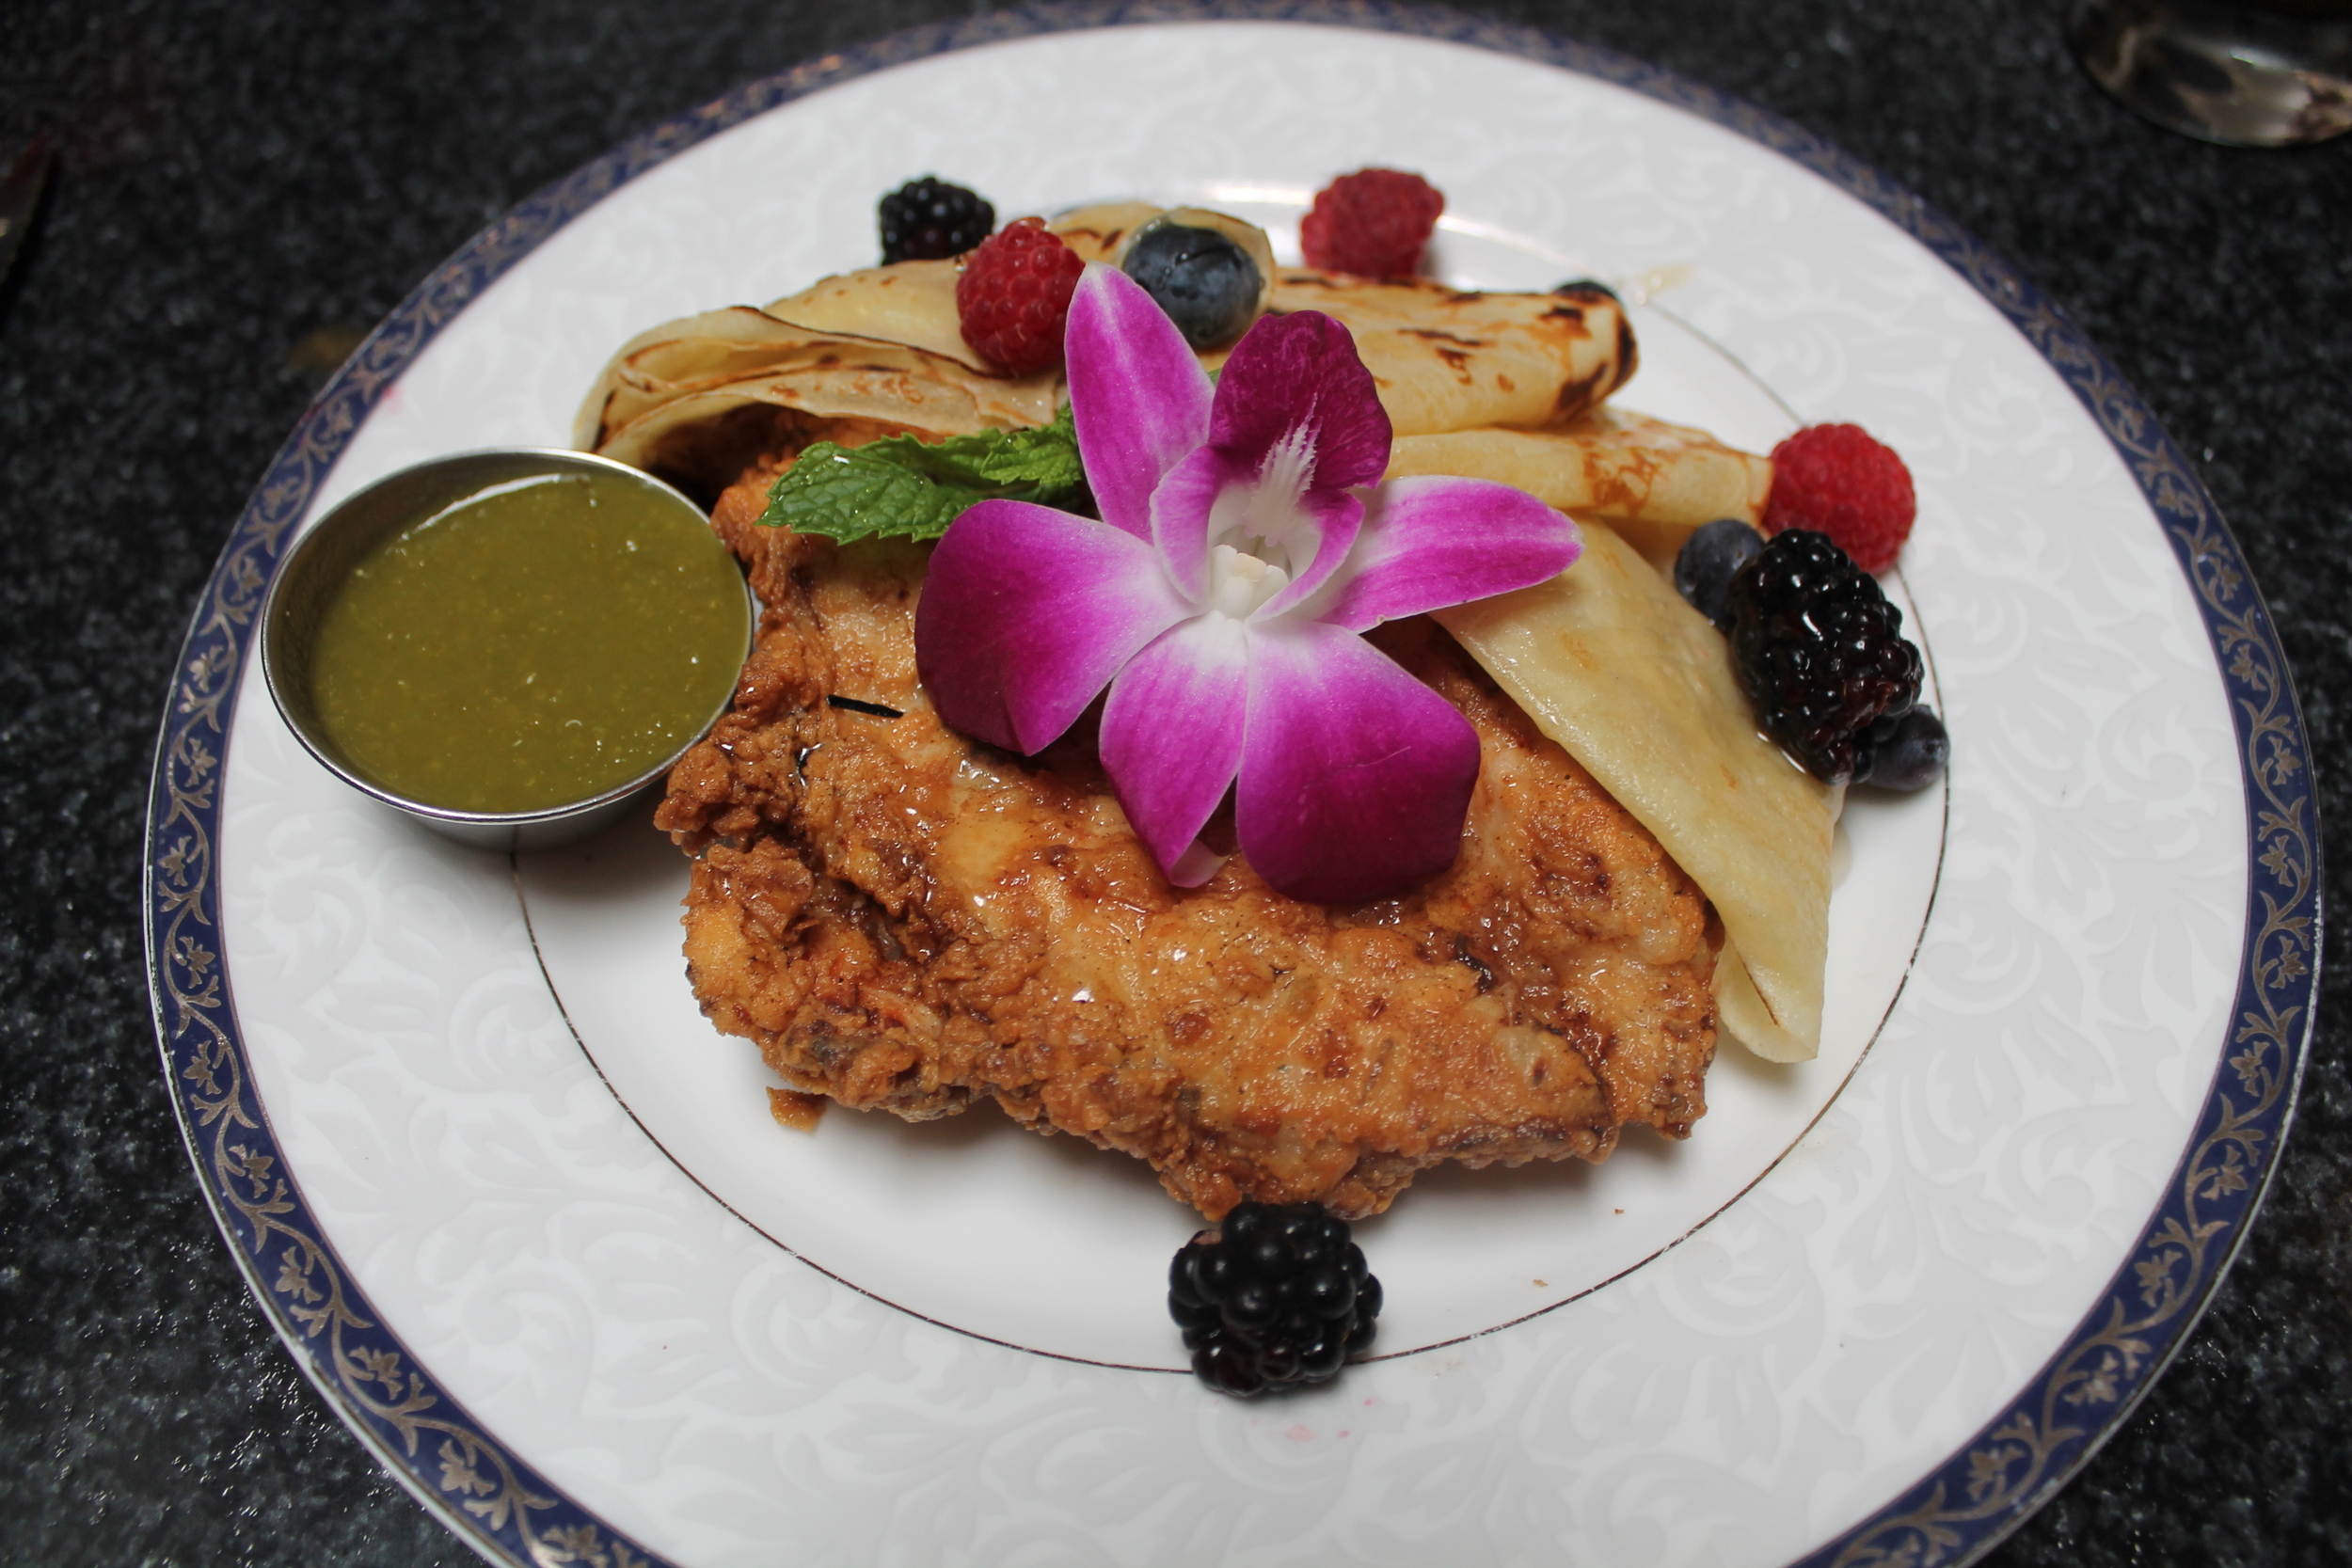 Crispy Chicken and Crepes:Jidori chicken breast, Pudwill Farms berries, local organic hone